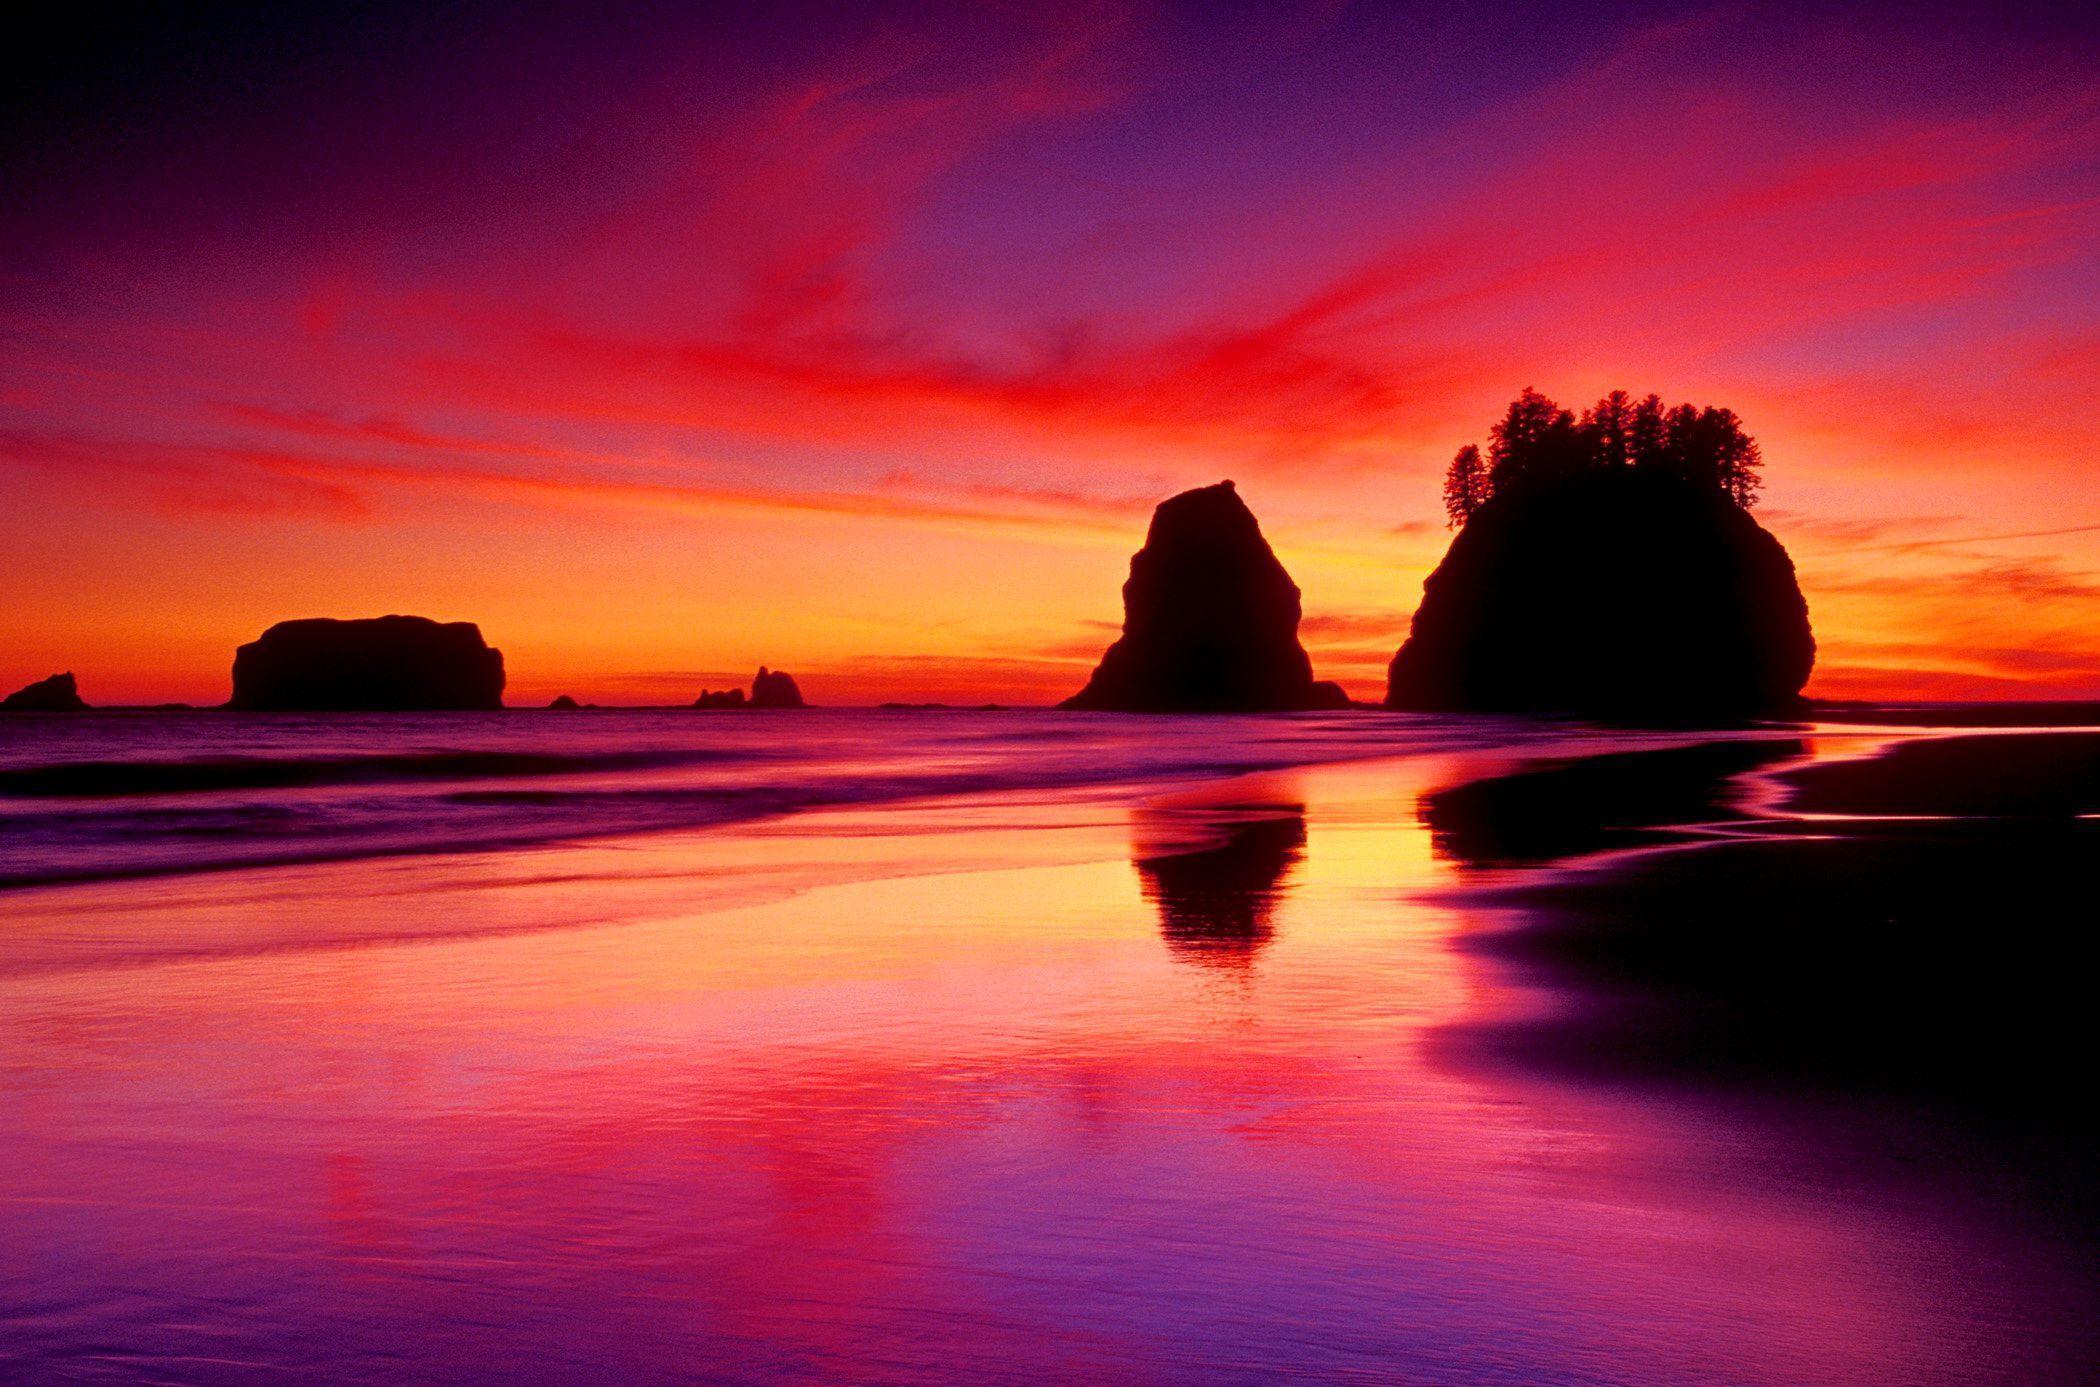 sunset wallpapers for desktop - photo #28